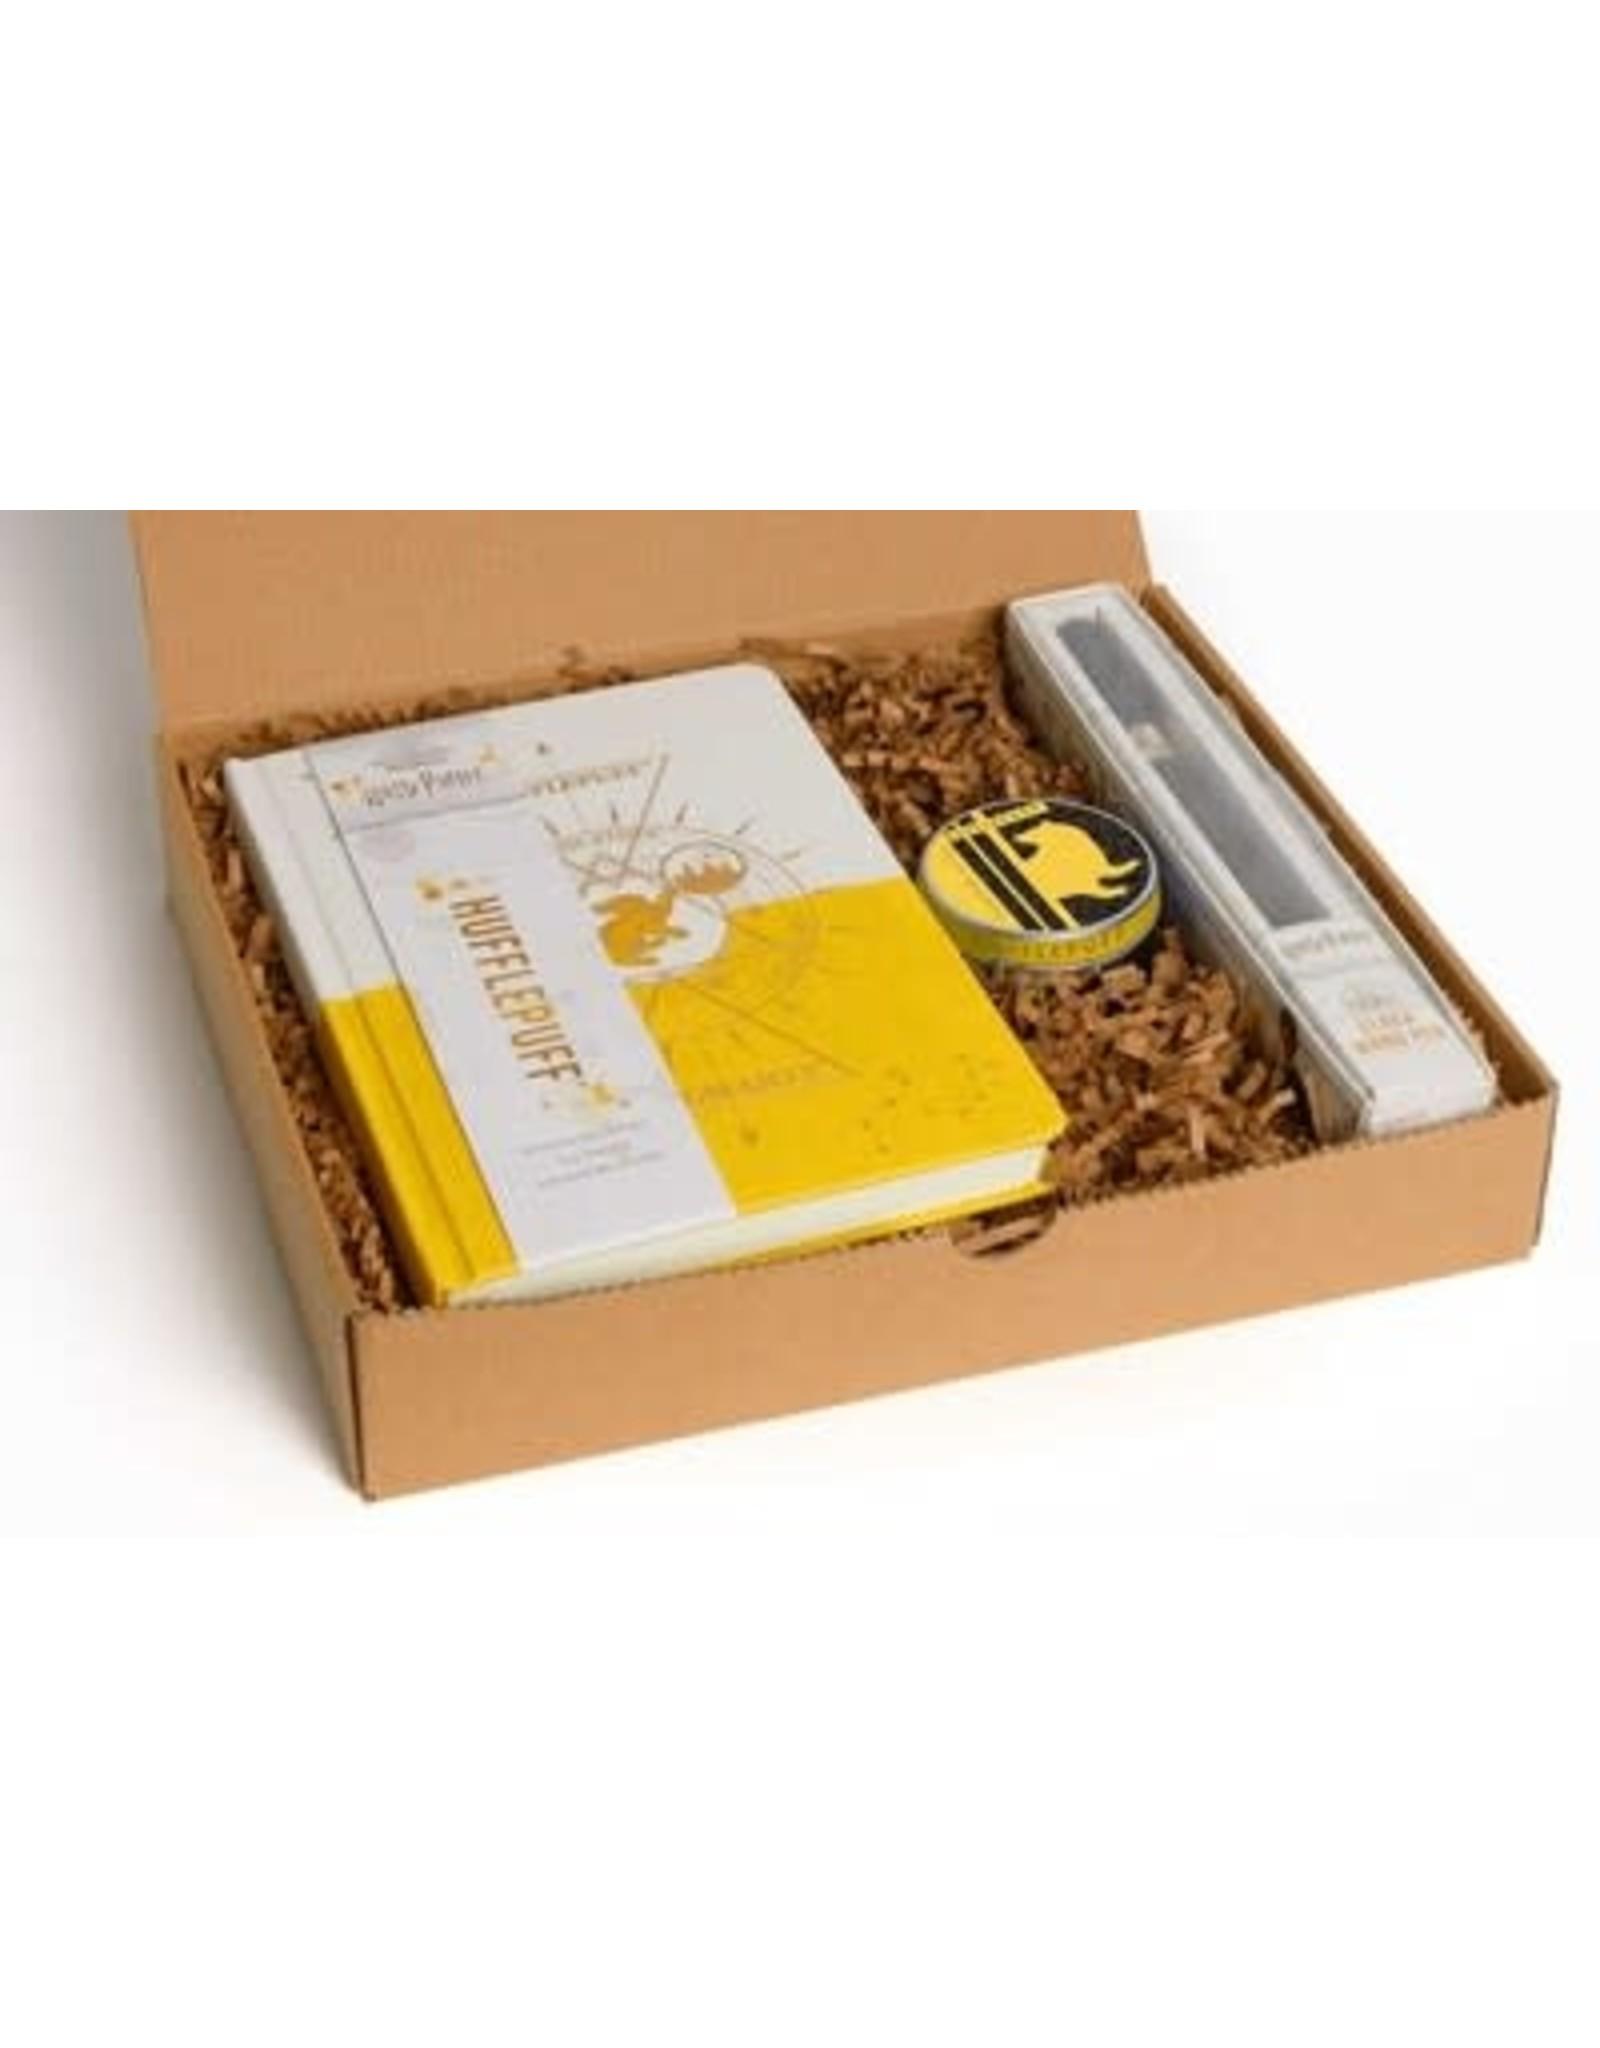 Simon & Schuster Harry Potter Hufflepuff Boxed Gift Set